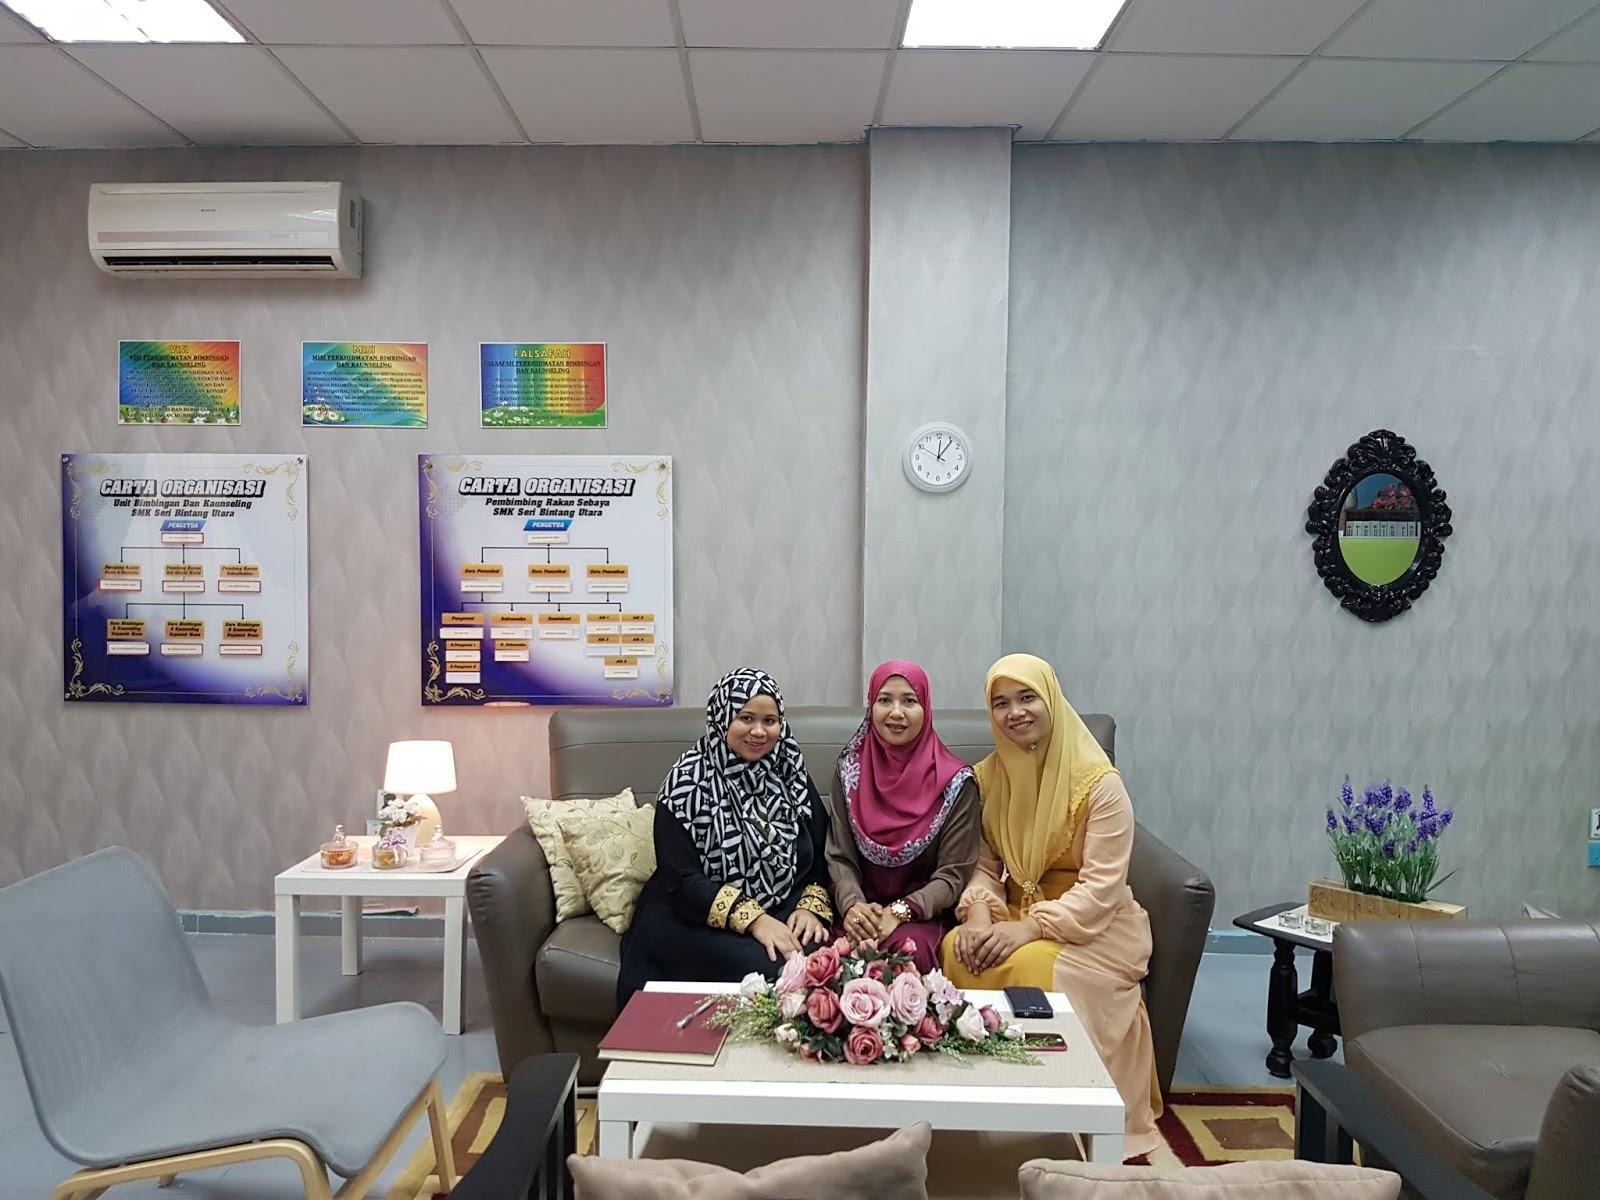 Kaunselor Nurhaiza Che Mat Bilik Kaunseling Teraputik Dan Kondusif Smk Sri Bintang Utara Kl